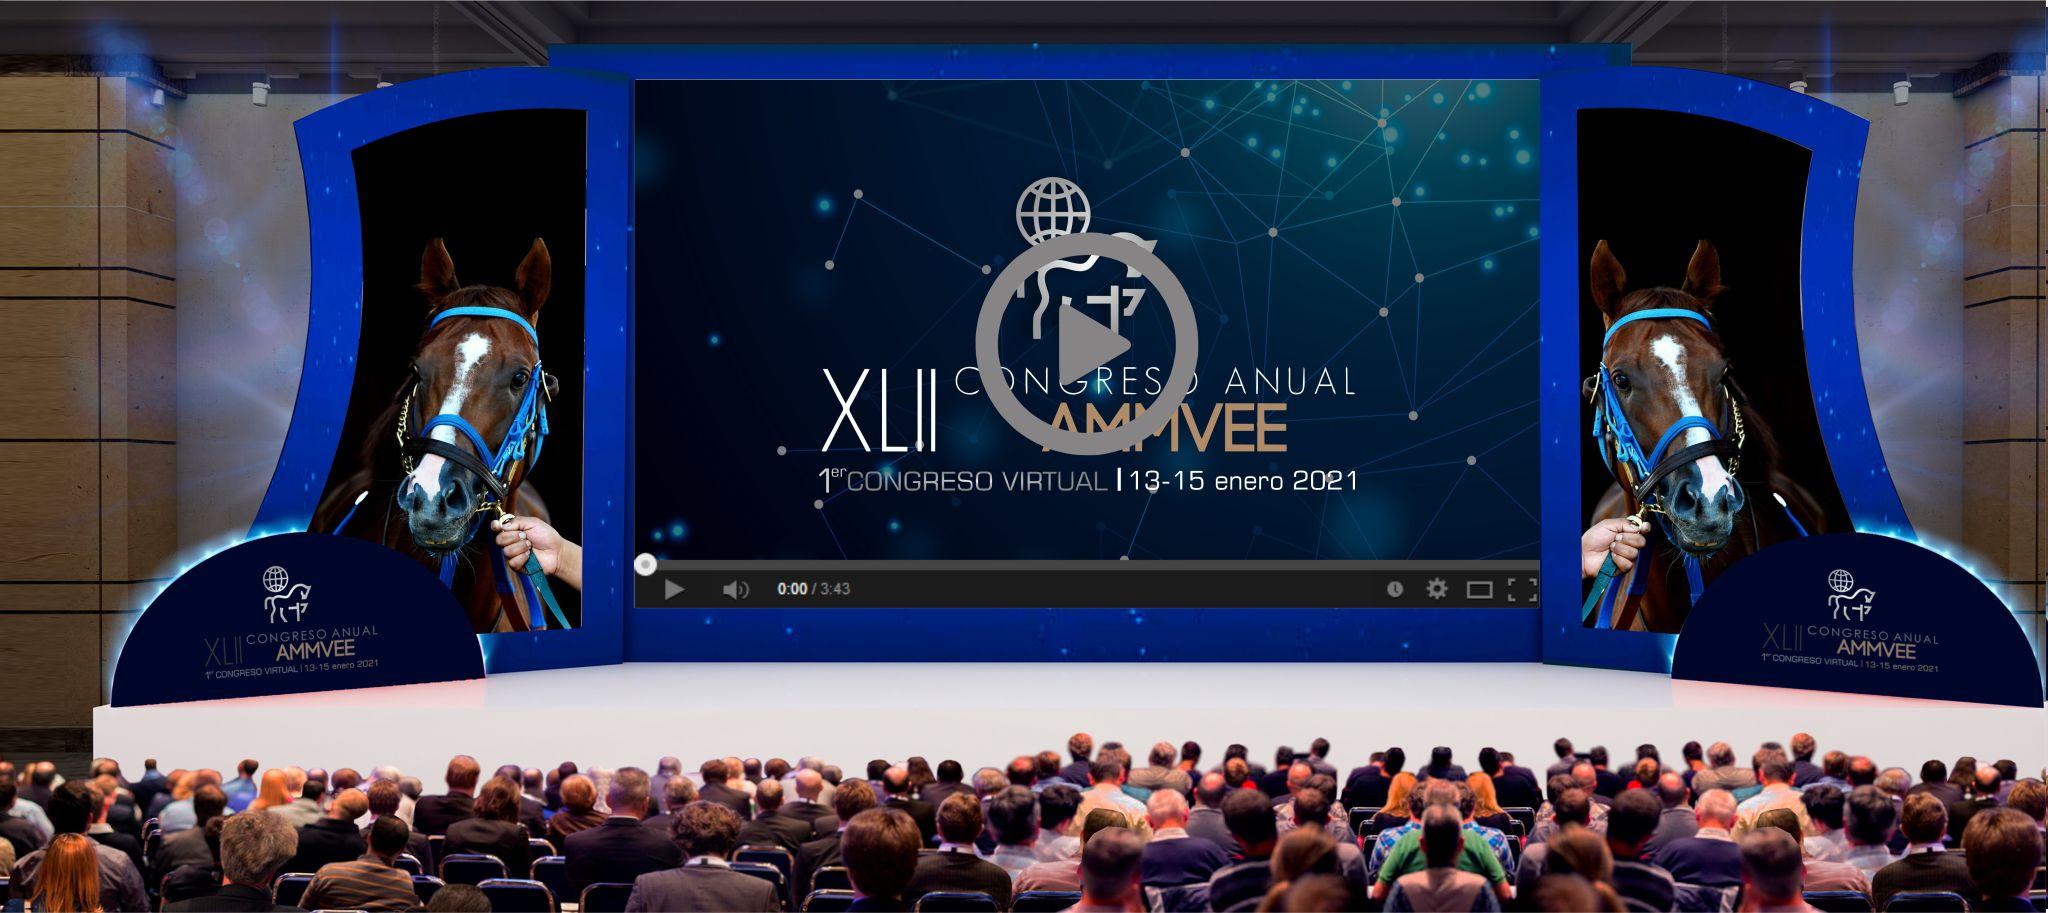 Congreso virtual AMMVEE - Plataforma virtual